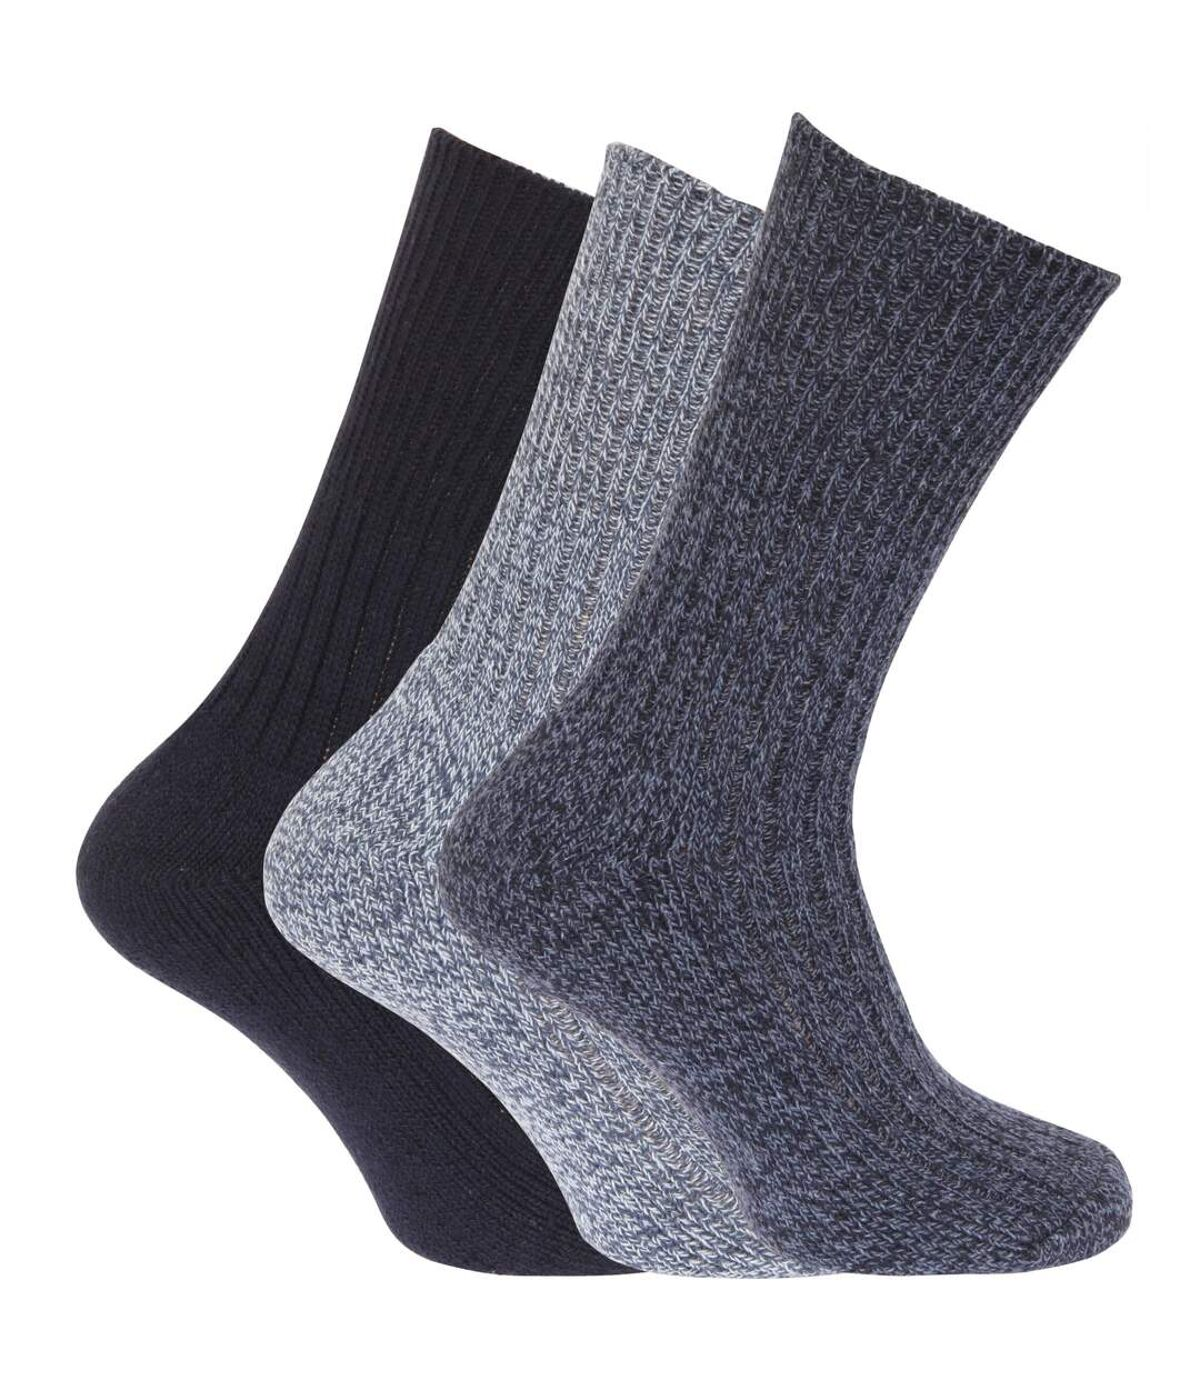 Mens Wool Blend Non Elastic Top Light Hold Socks (Pack Of 3) (Shades of Blue) - UTMB159